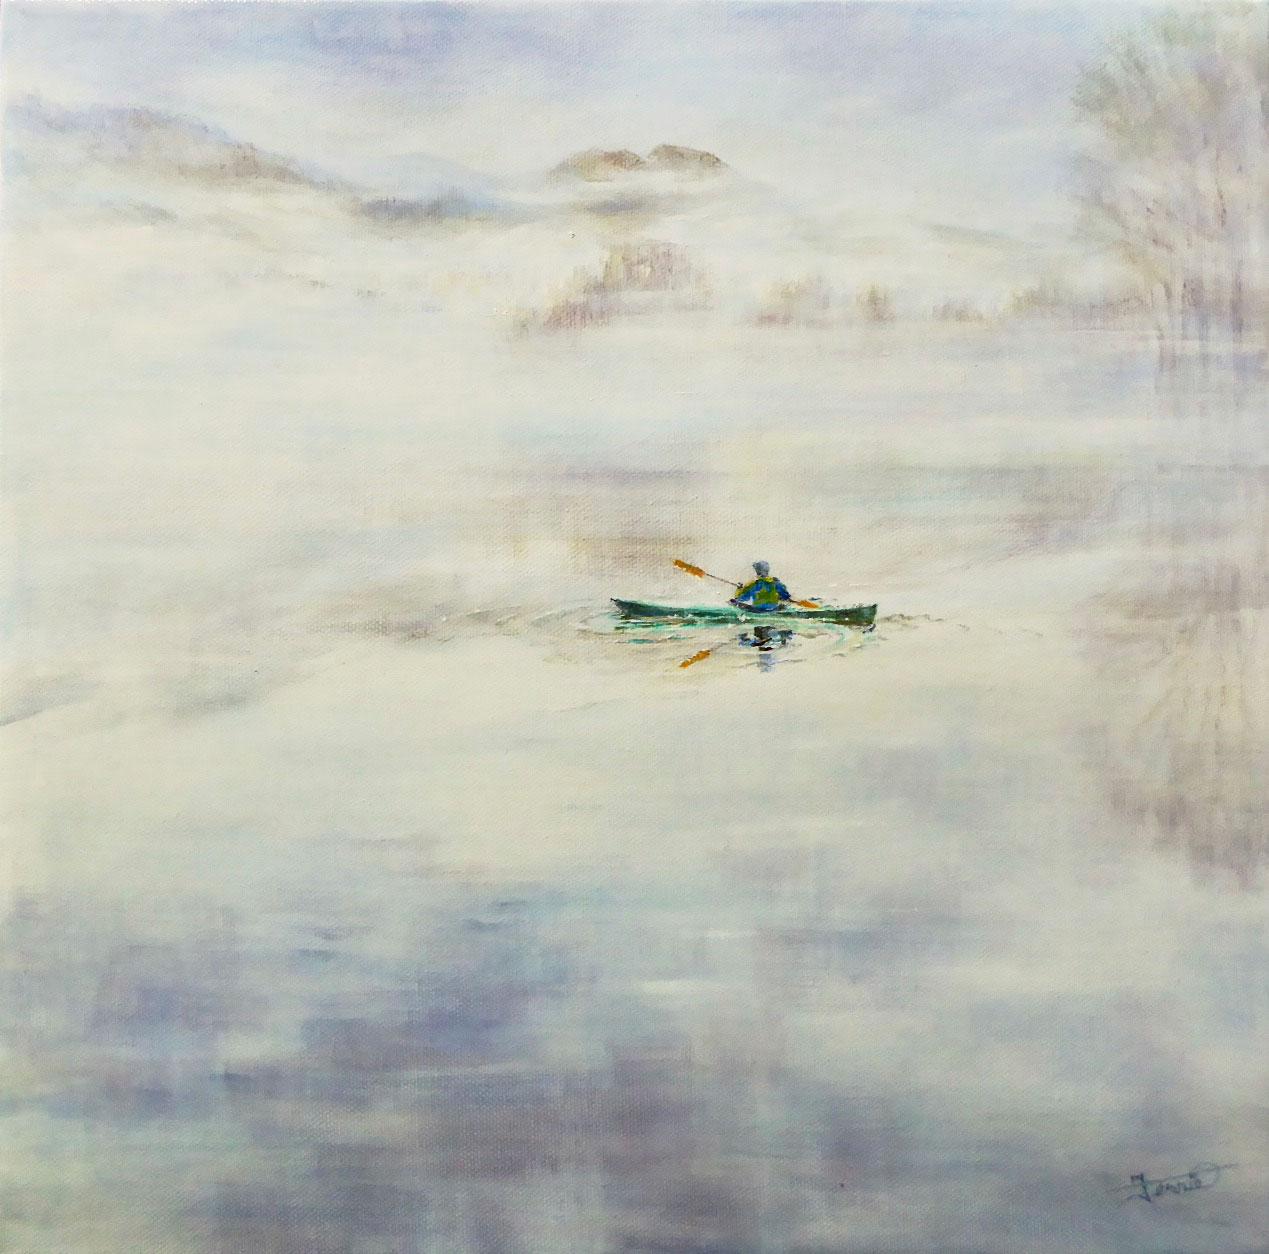 Susan Clare M Fernie - The Green Kayak